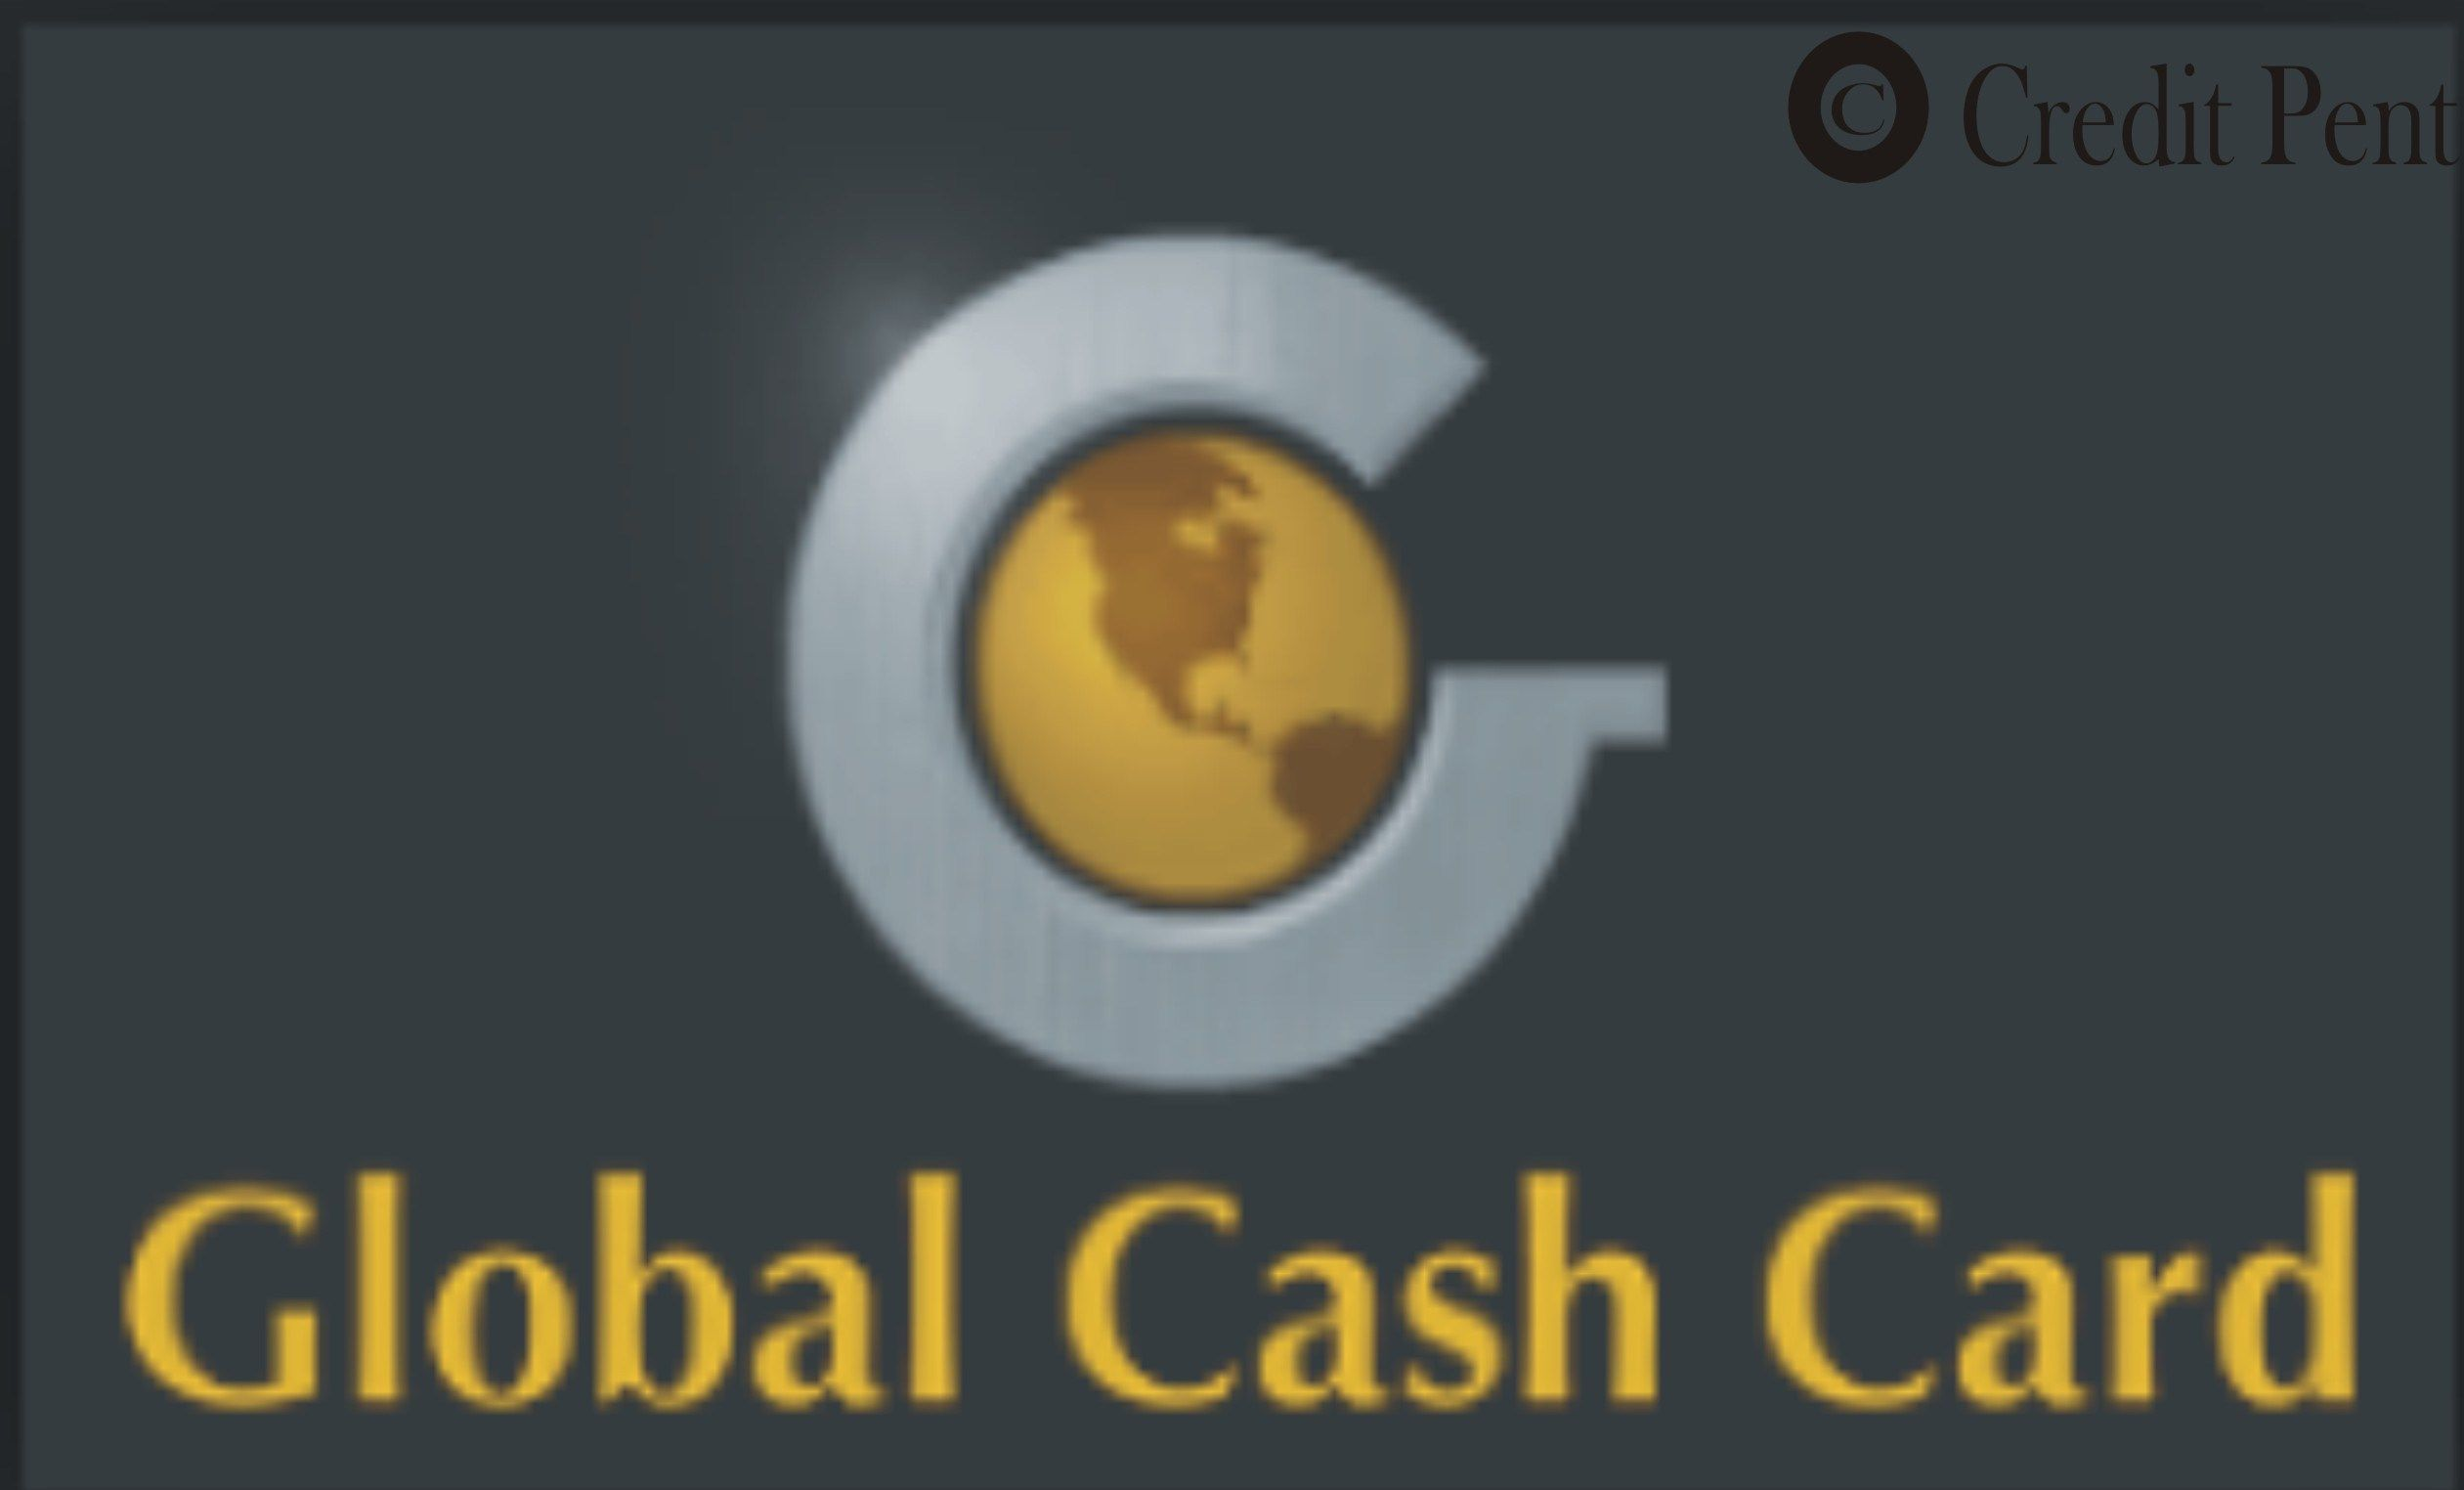 Global cash card login prepaid credit card cash card